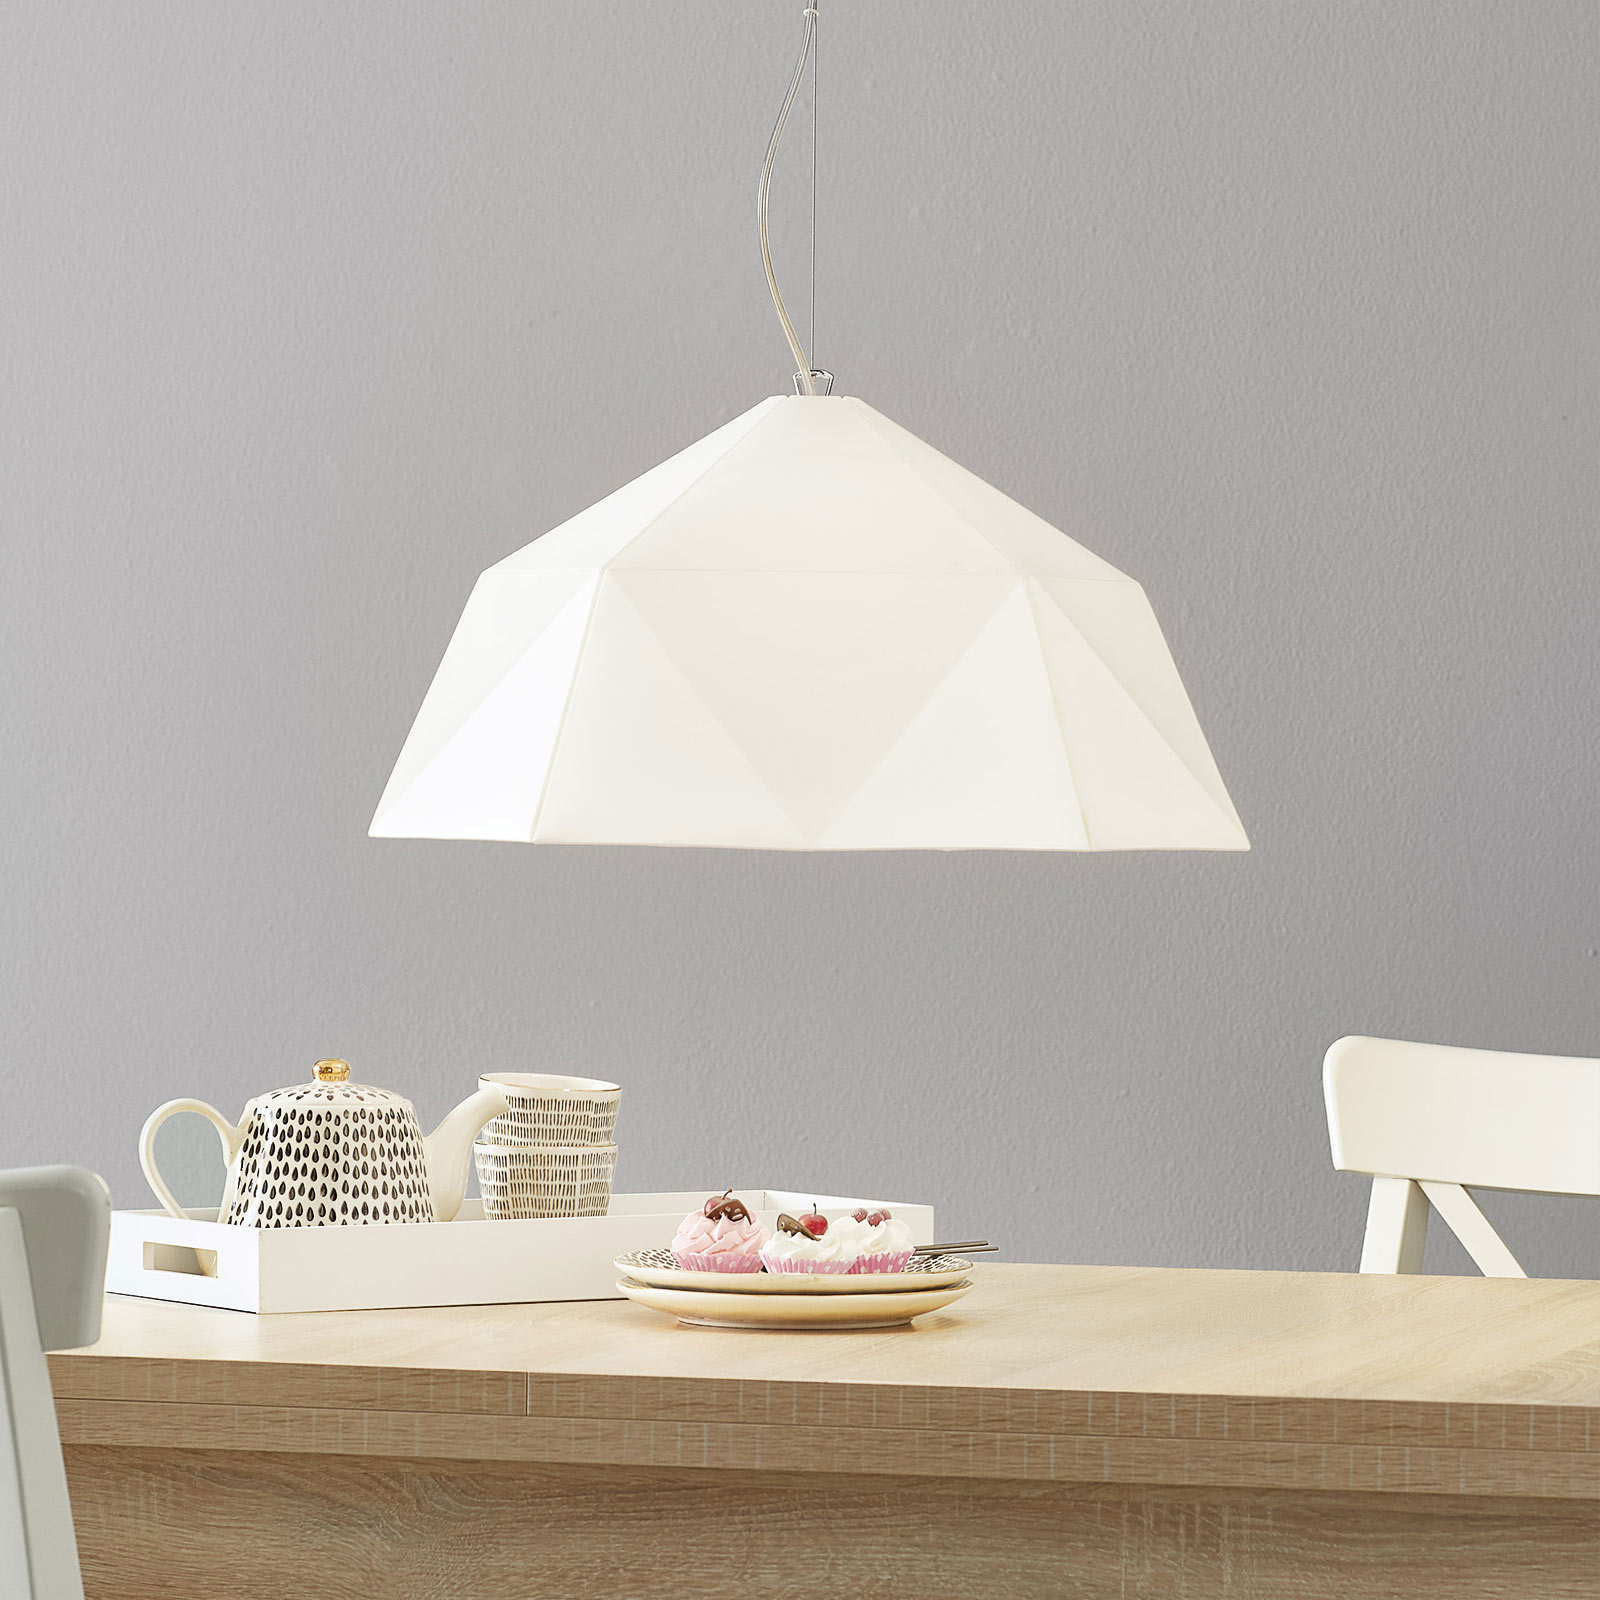 White pendant light Circus_1056082_1